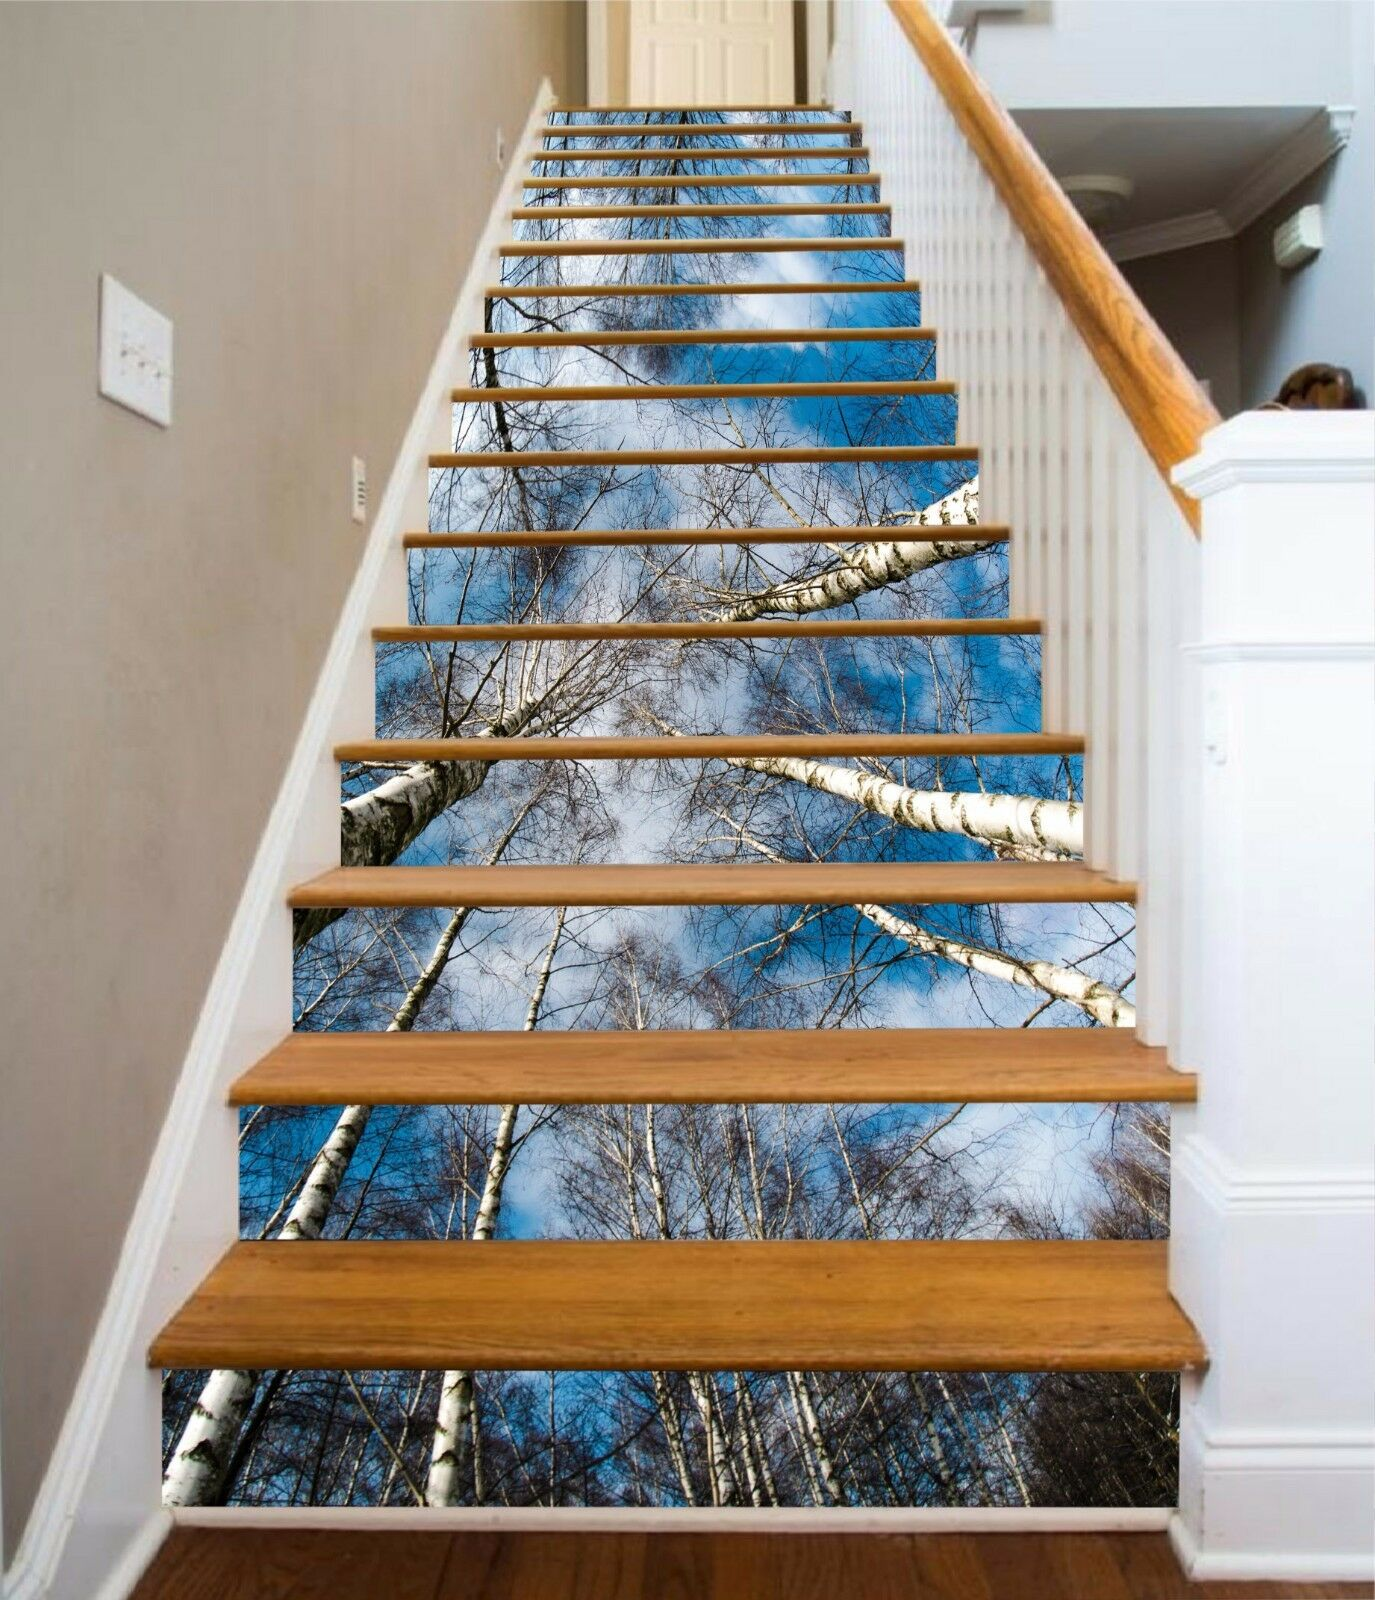 3D Sky Tree 352 Stair Risers Decoration Photo Mural Vinyl Decal Wallpaper UK